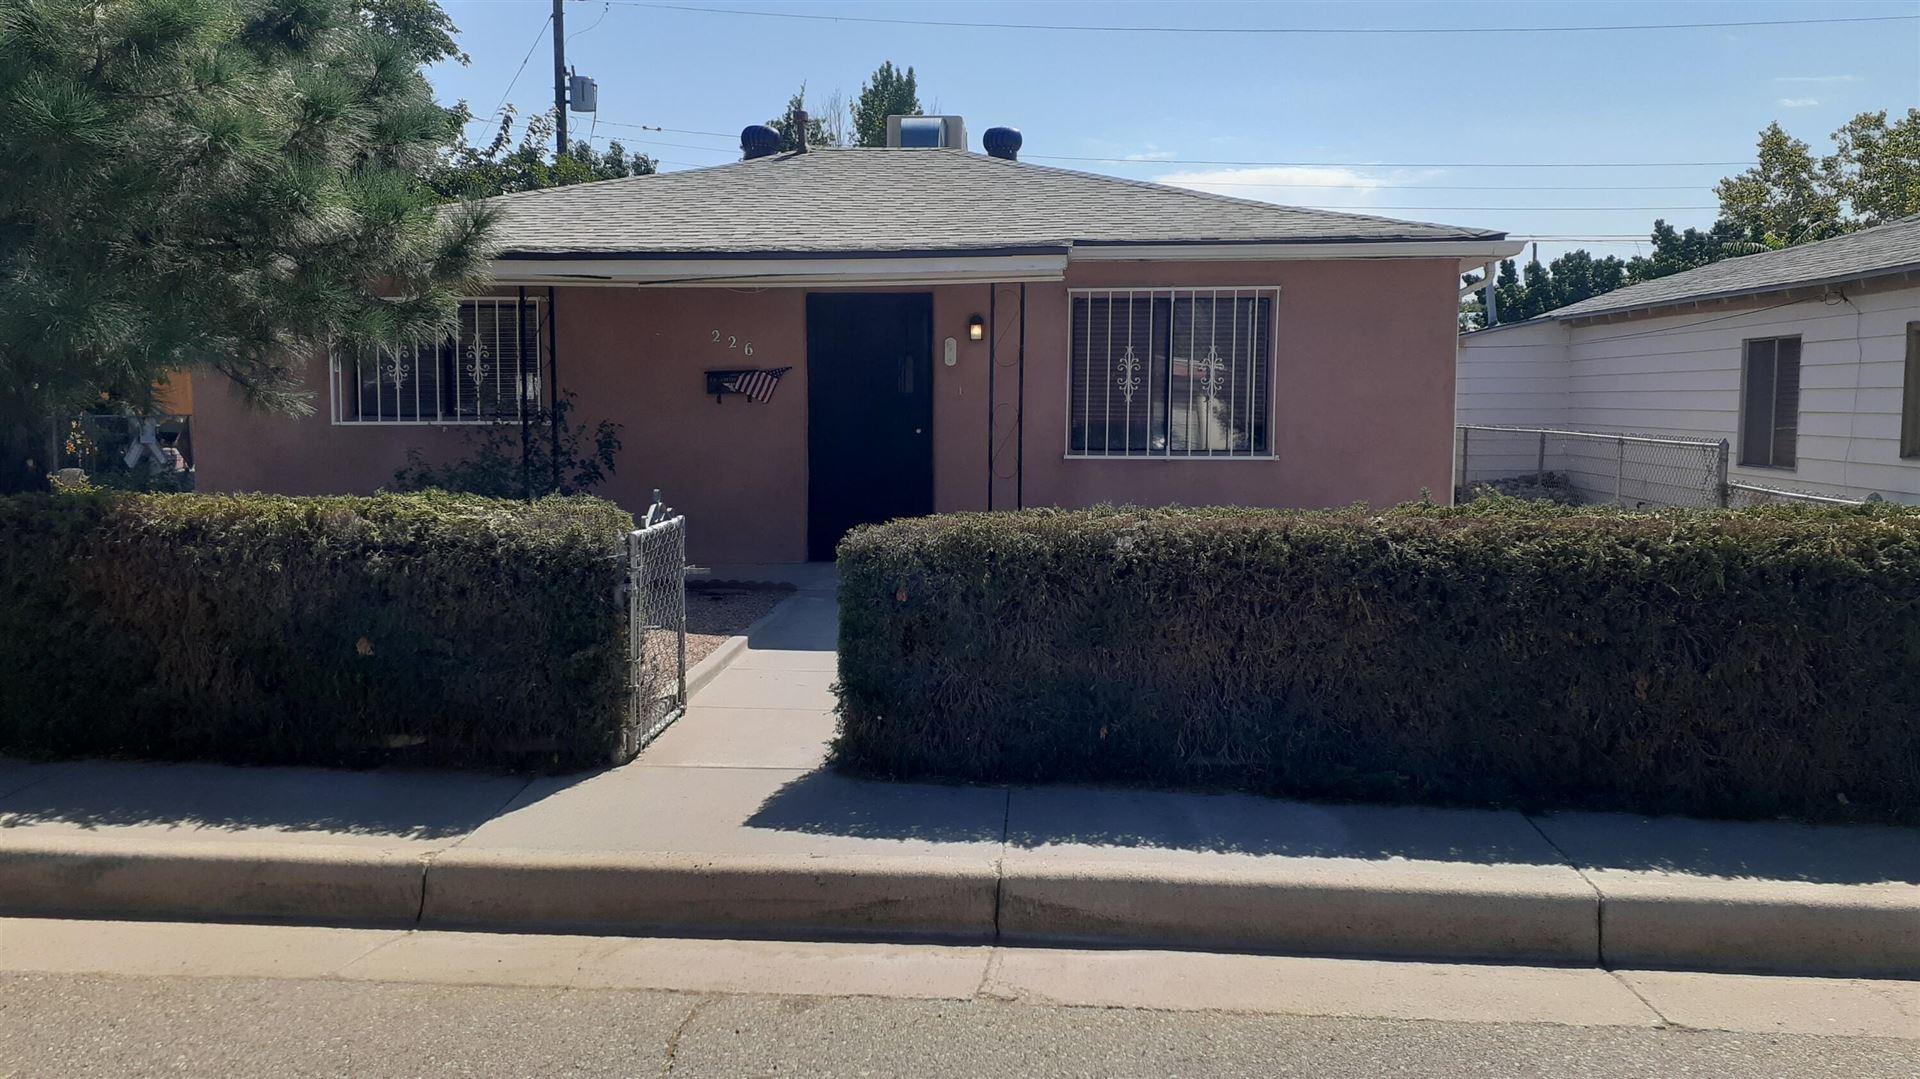 226 SAN ANDRES Avenue NW, Albuquerque, NM 87107 - #: 1001647